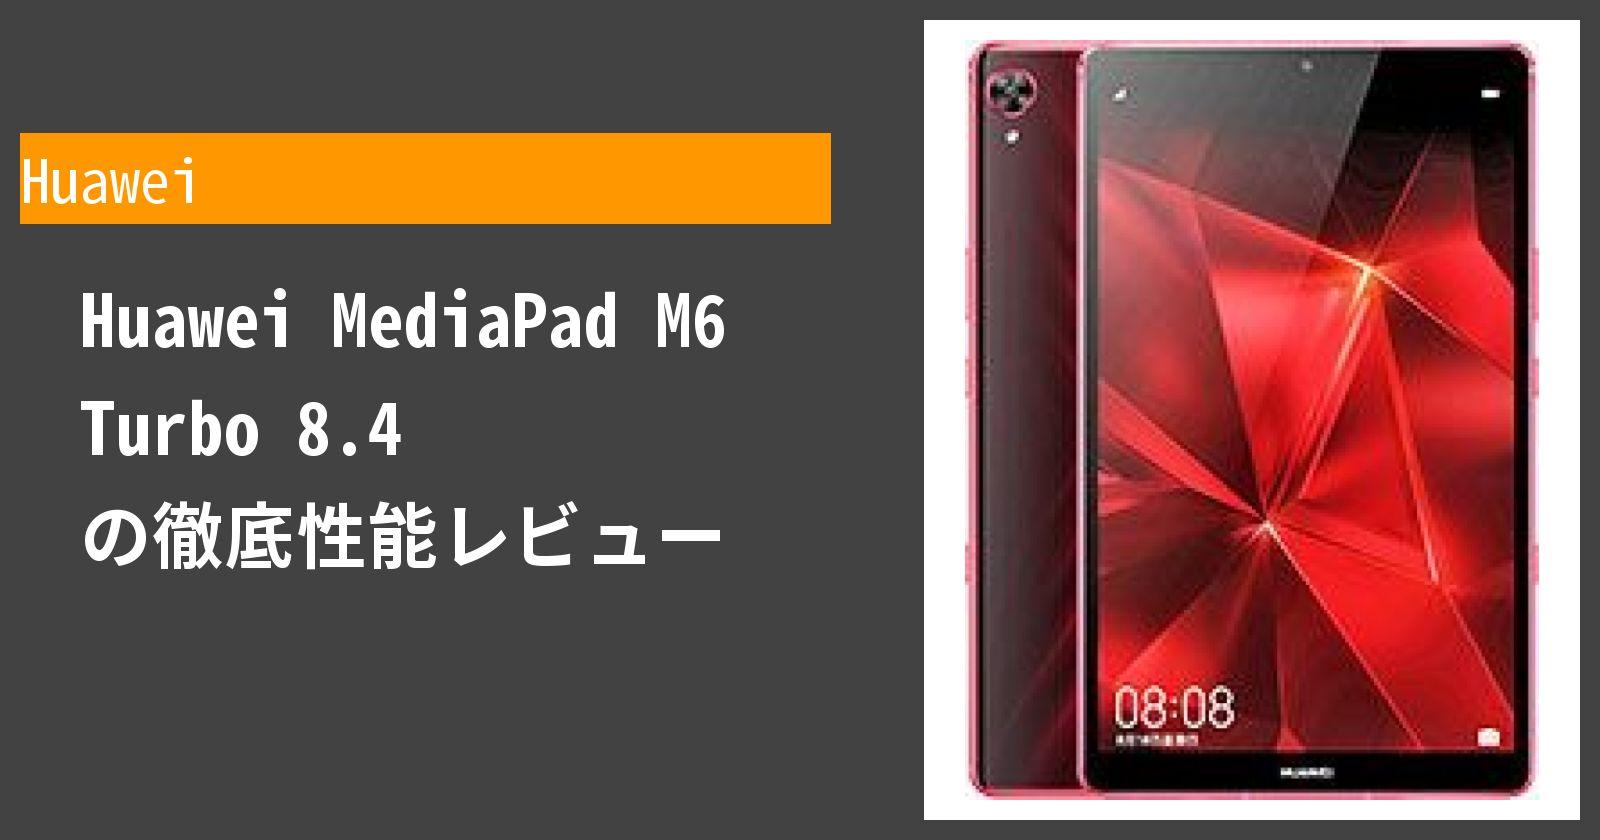 Huawei MediaPad M6 Turbo 8.4 の徹底性能レビュー